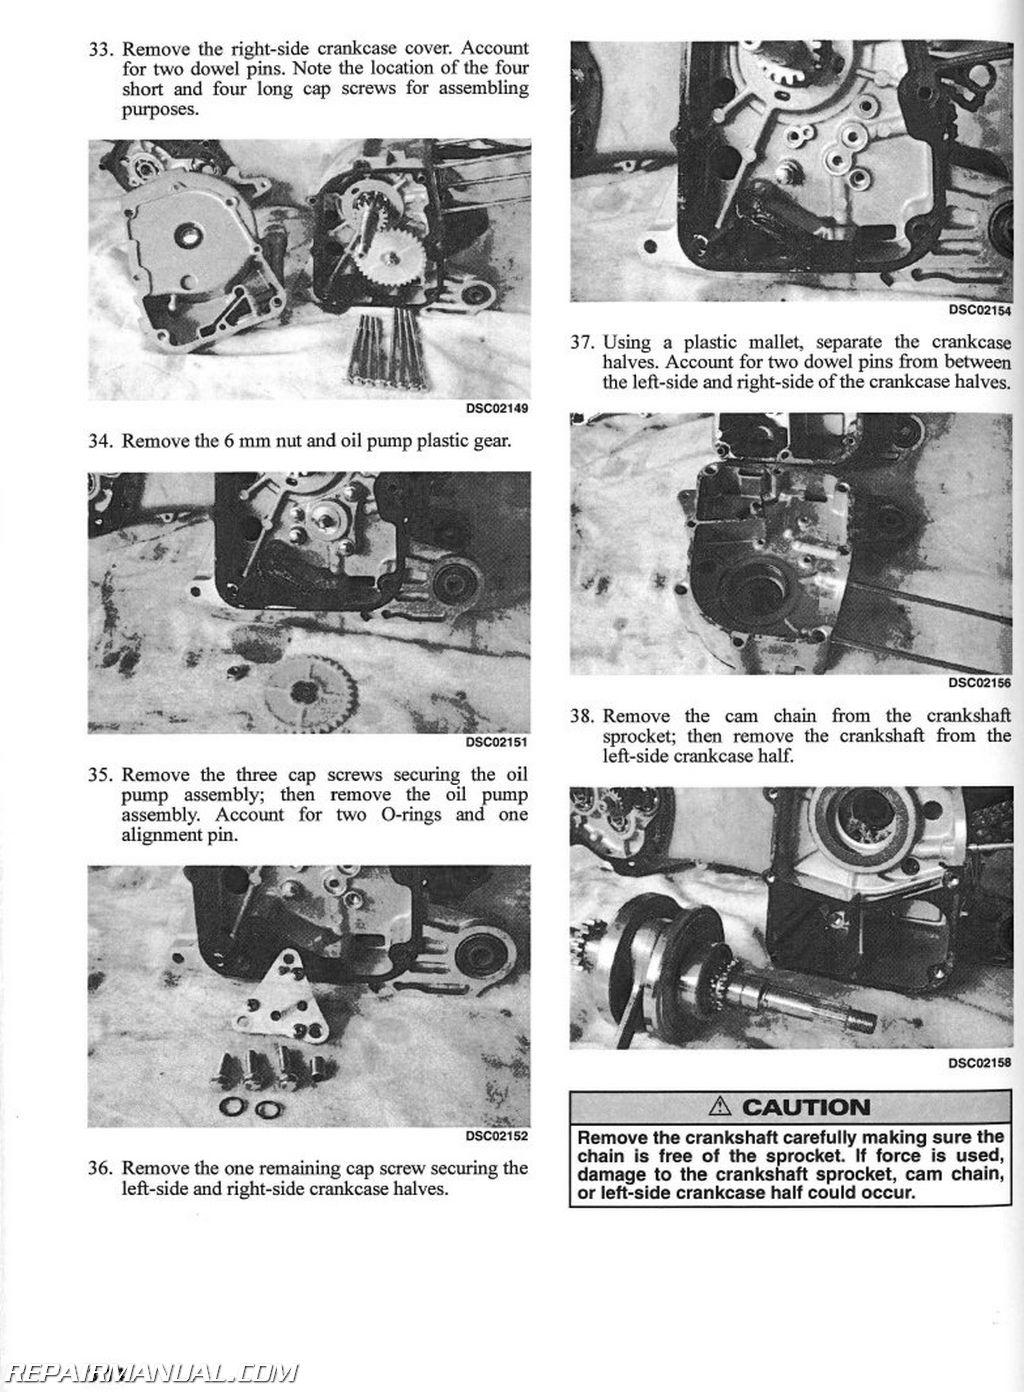 4 Stroke Motorcycle Engine Diagram 2004 Arctic Cat 90 Atv Service Manual